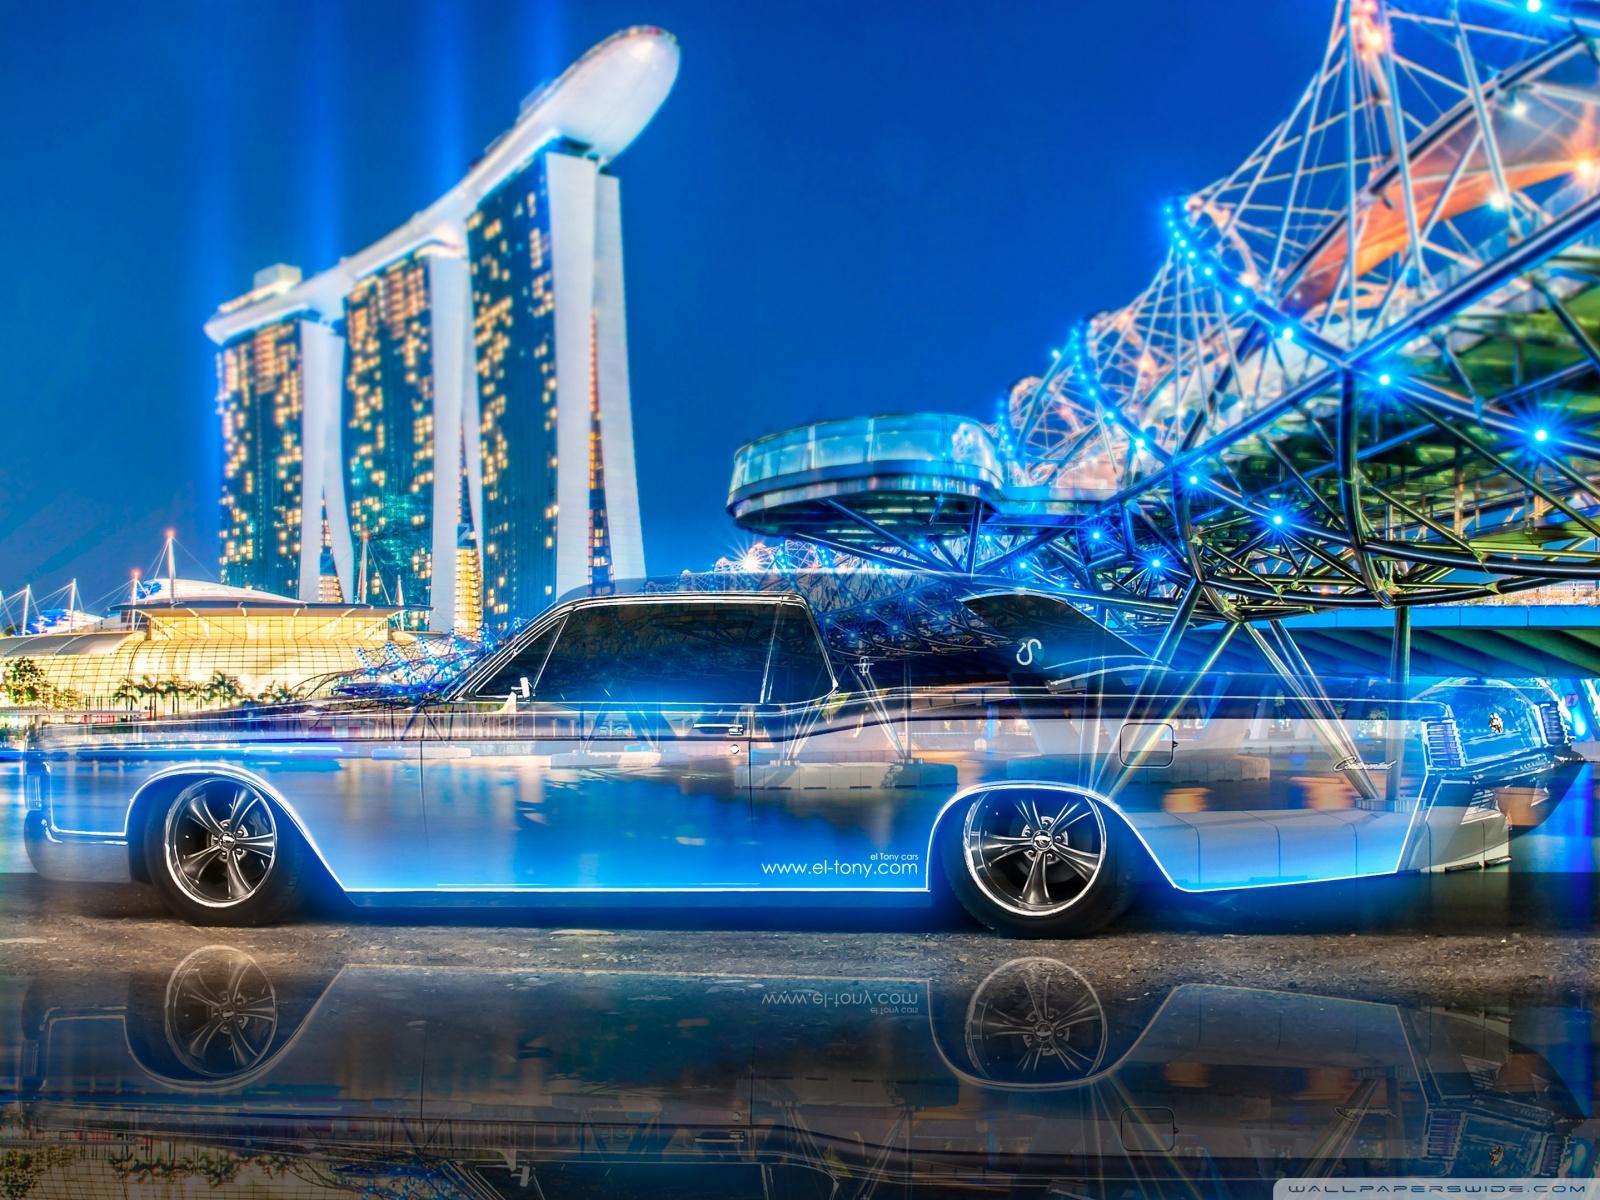 Free Lincoln Continental Crystal City Night Neon phone wallpaper by kearsha